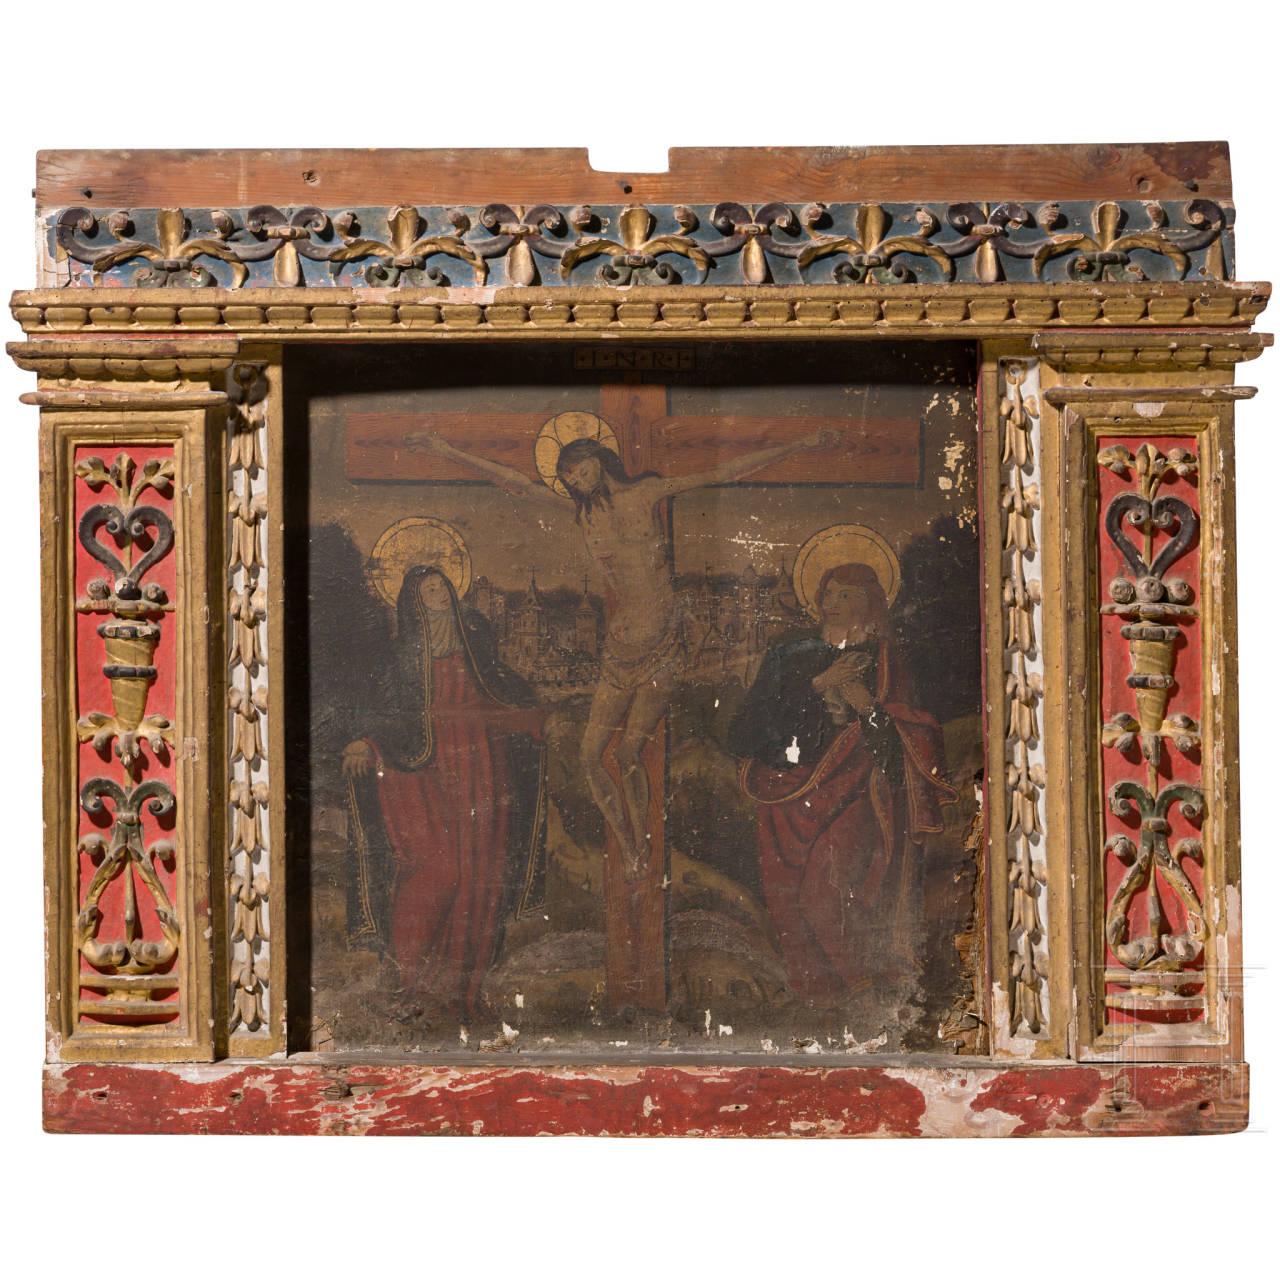 Tafelbild, Kreuzigung Christi, flämisch, 2. Hälfte 15. Jhdt.